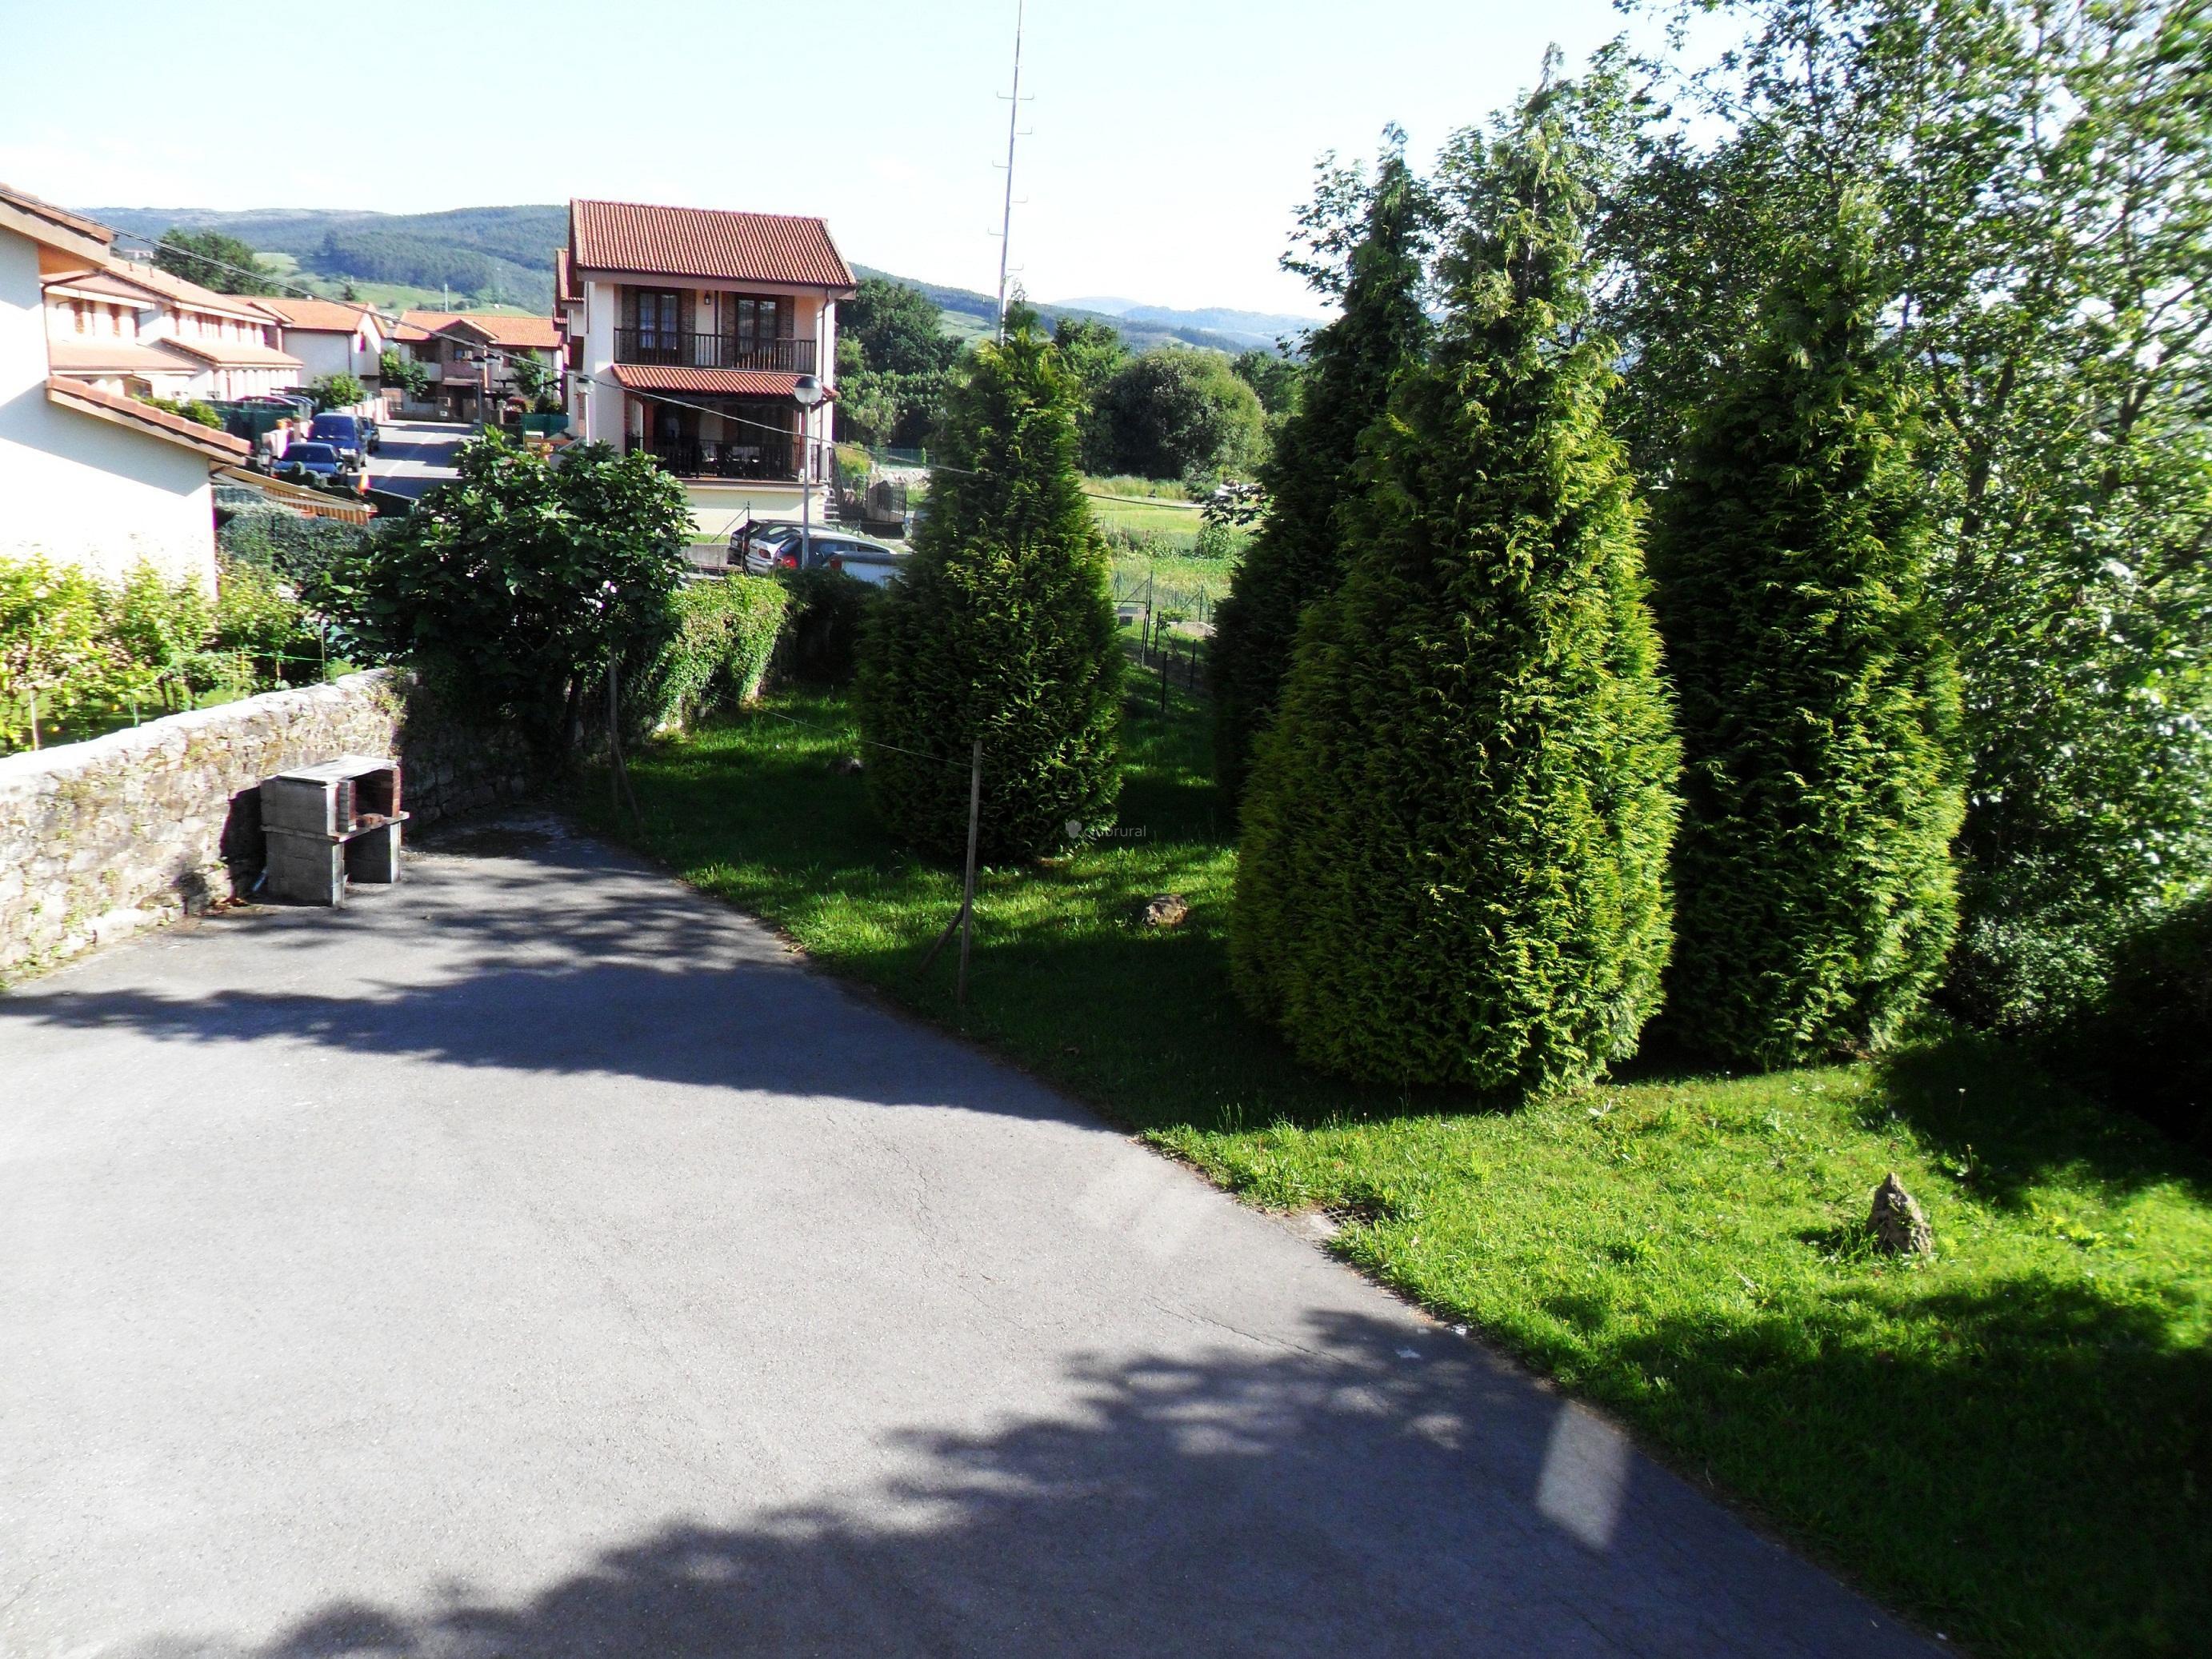 Fotos de casa la bolera cantabria quijano clubrural - Casas rurales cantabria baratas alquiler integro ...